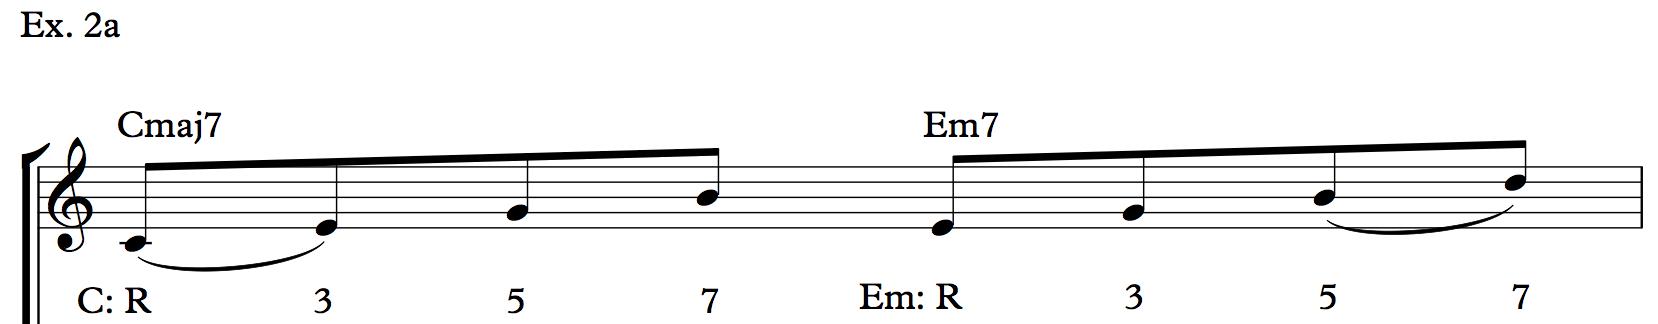 Nick Johnston Guitar - Arpeggio Sequence Lick - Ex. 2a